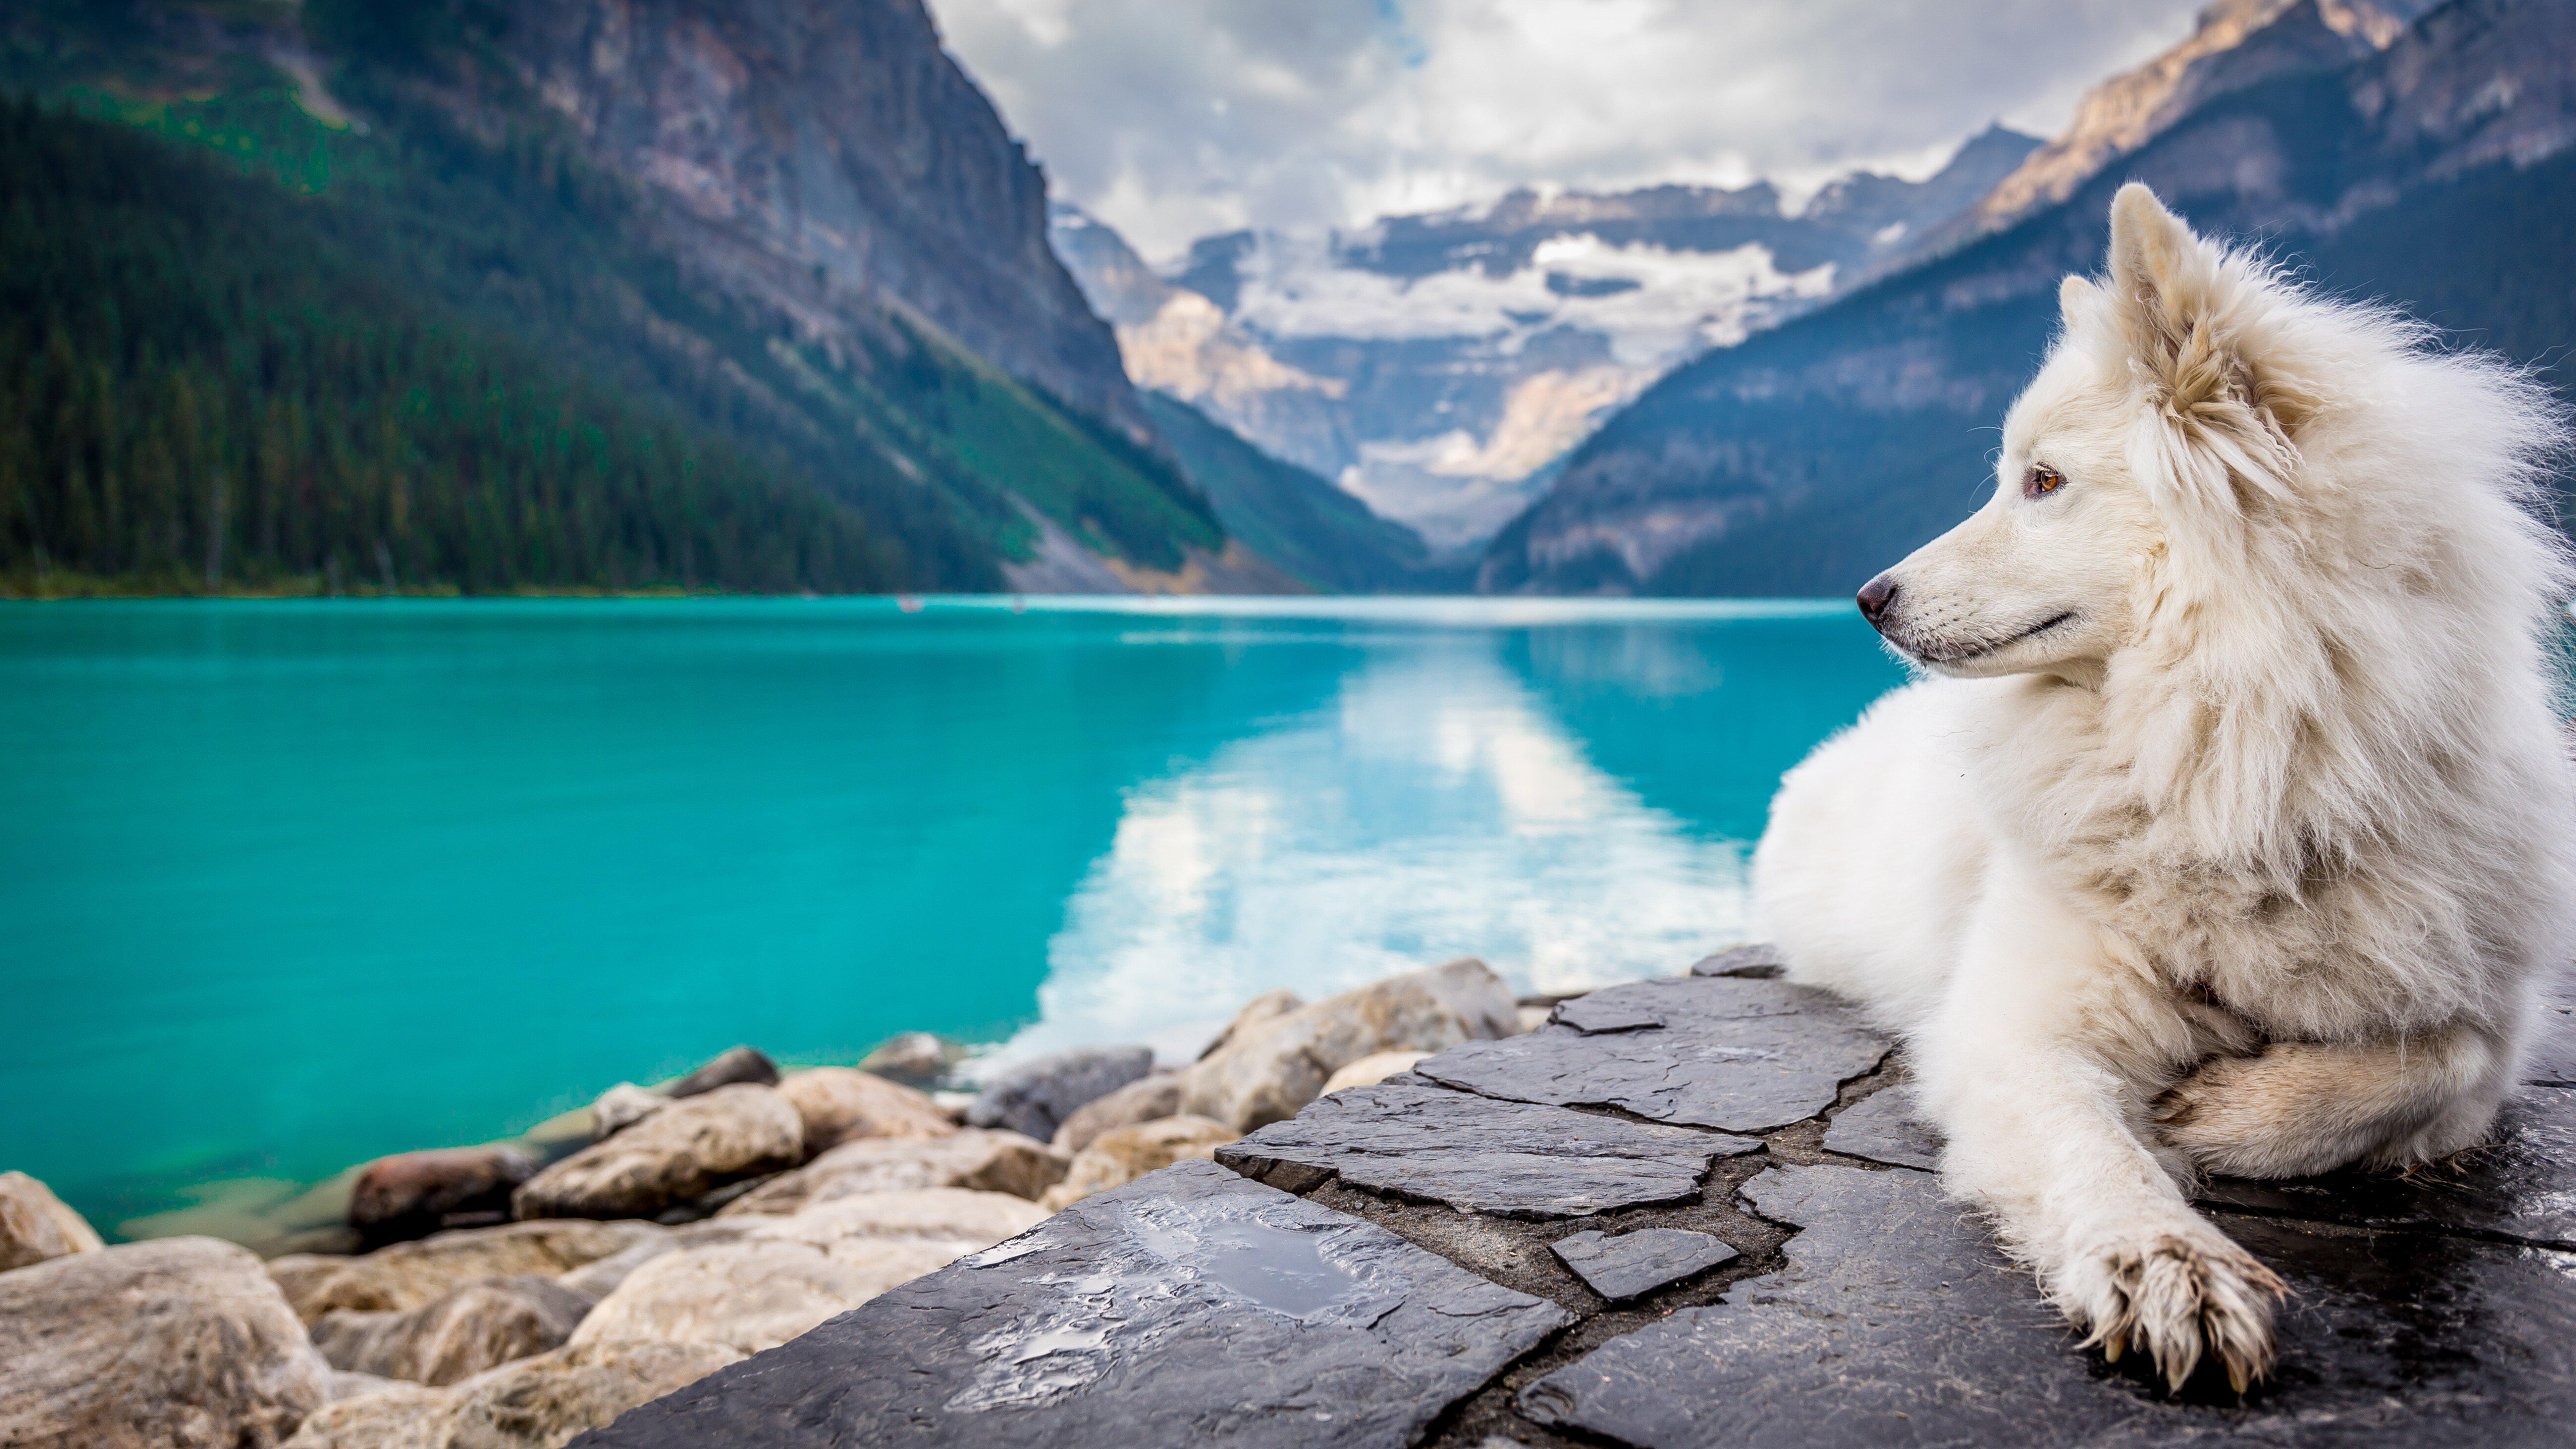 Wallpaper Samoyed in lake and mountains